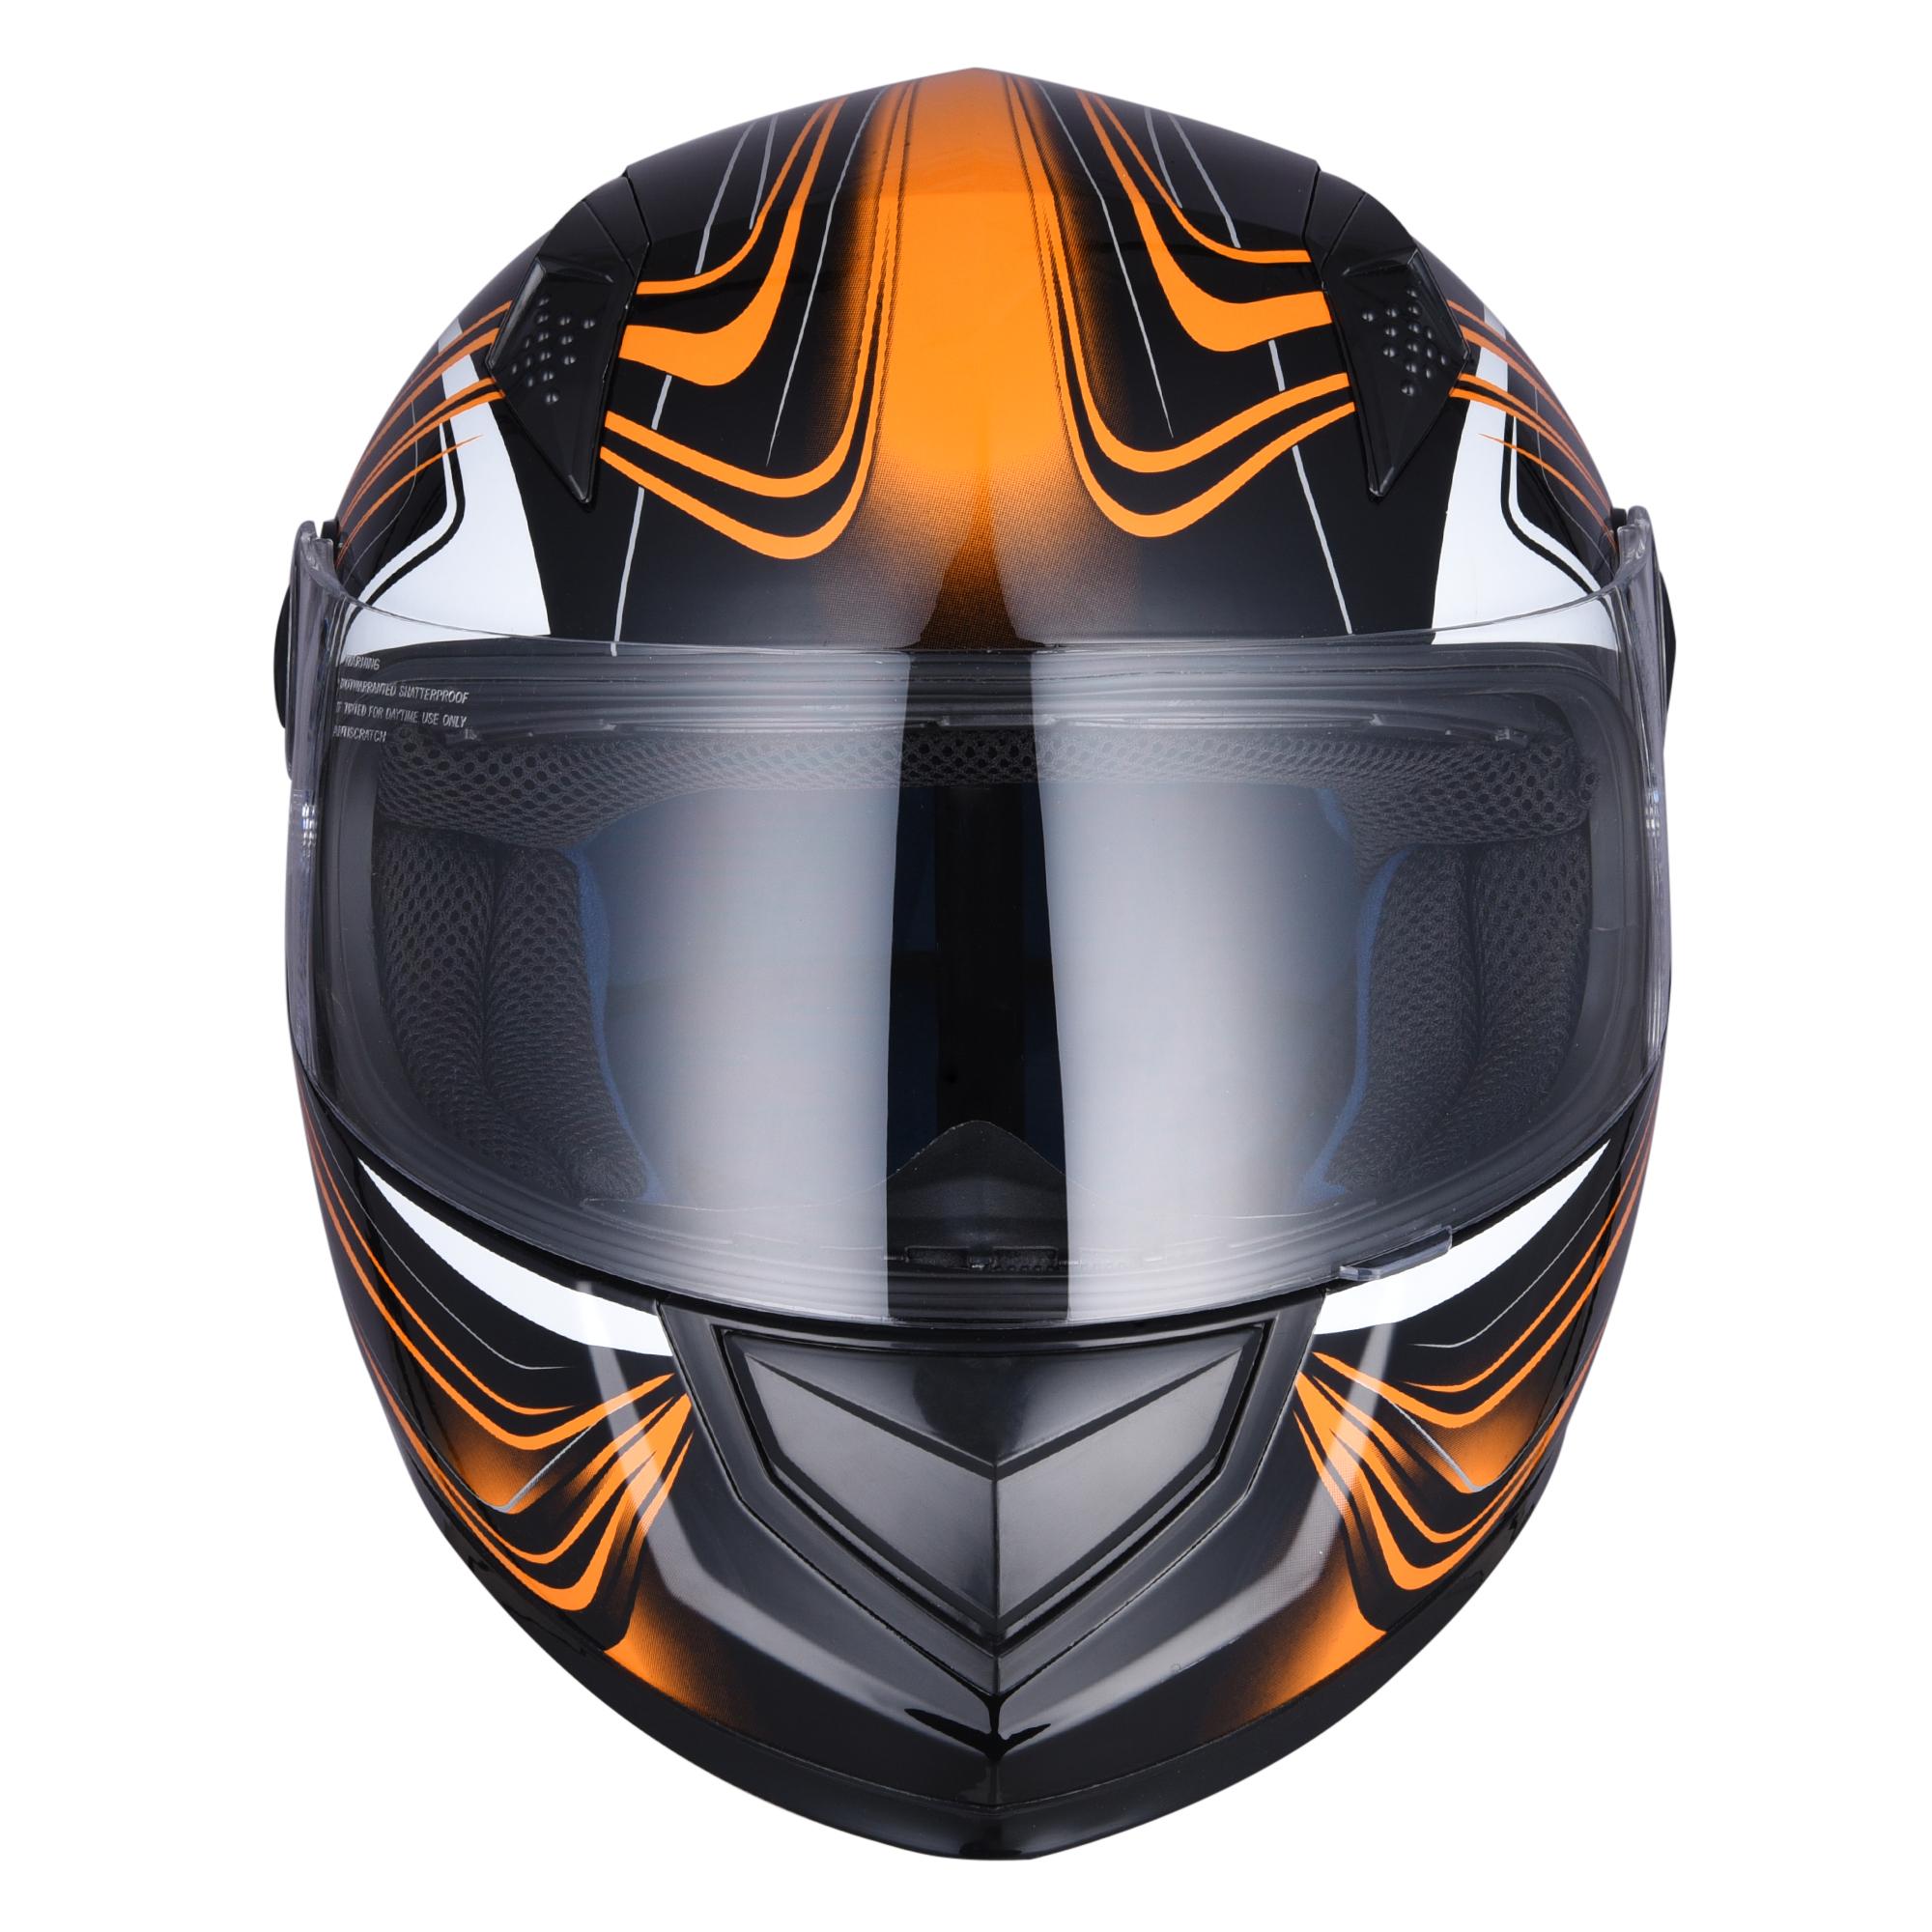 miniature 144 - AHR K12 Full Face Motorcycle Helmet DOT Air Vents Clear Visor Racing S M L XL